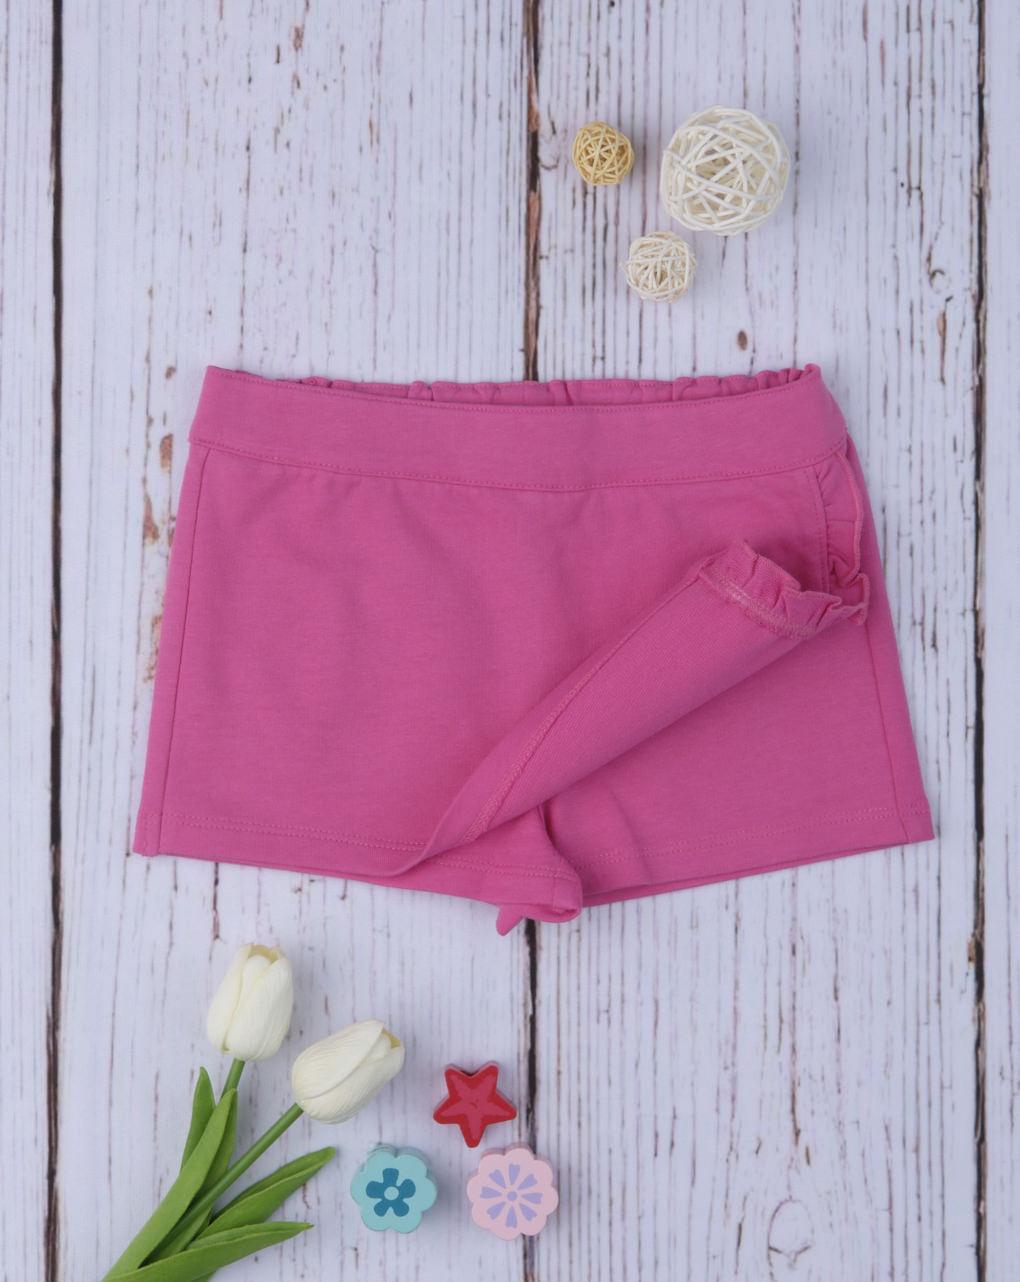 Shorts simil gonna pink - Prénatal